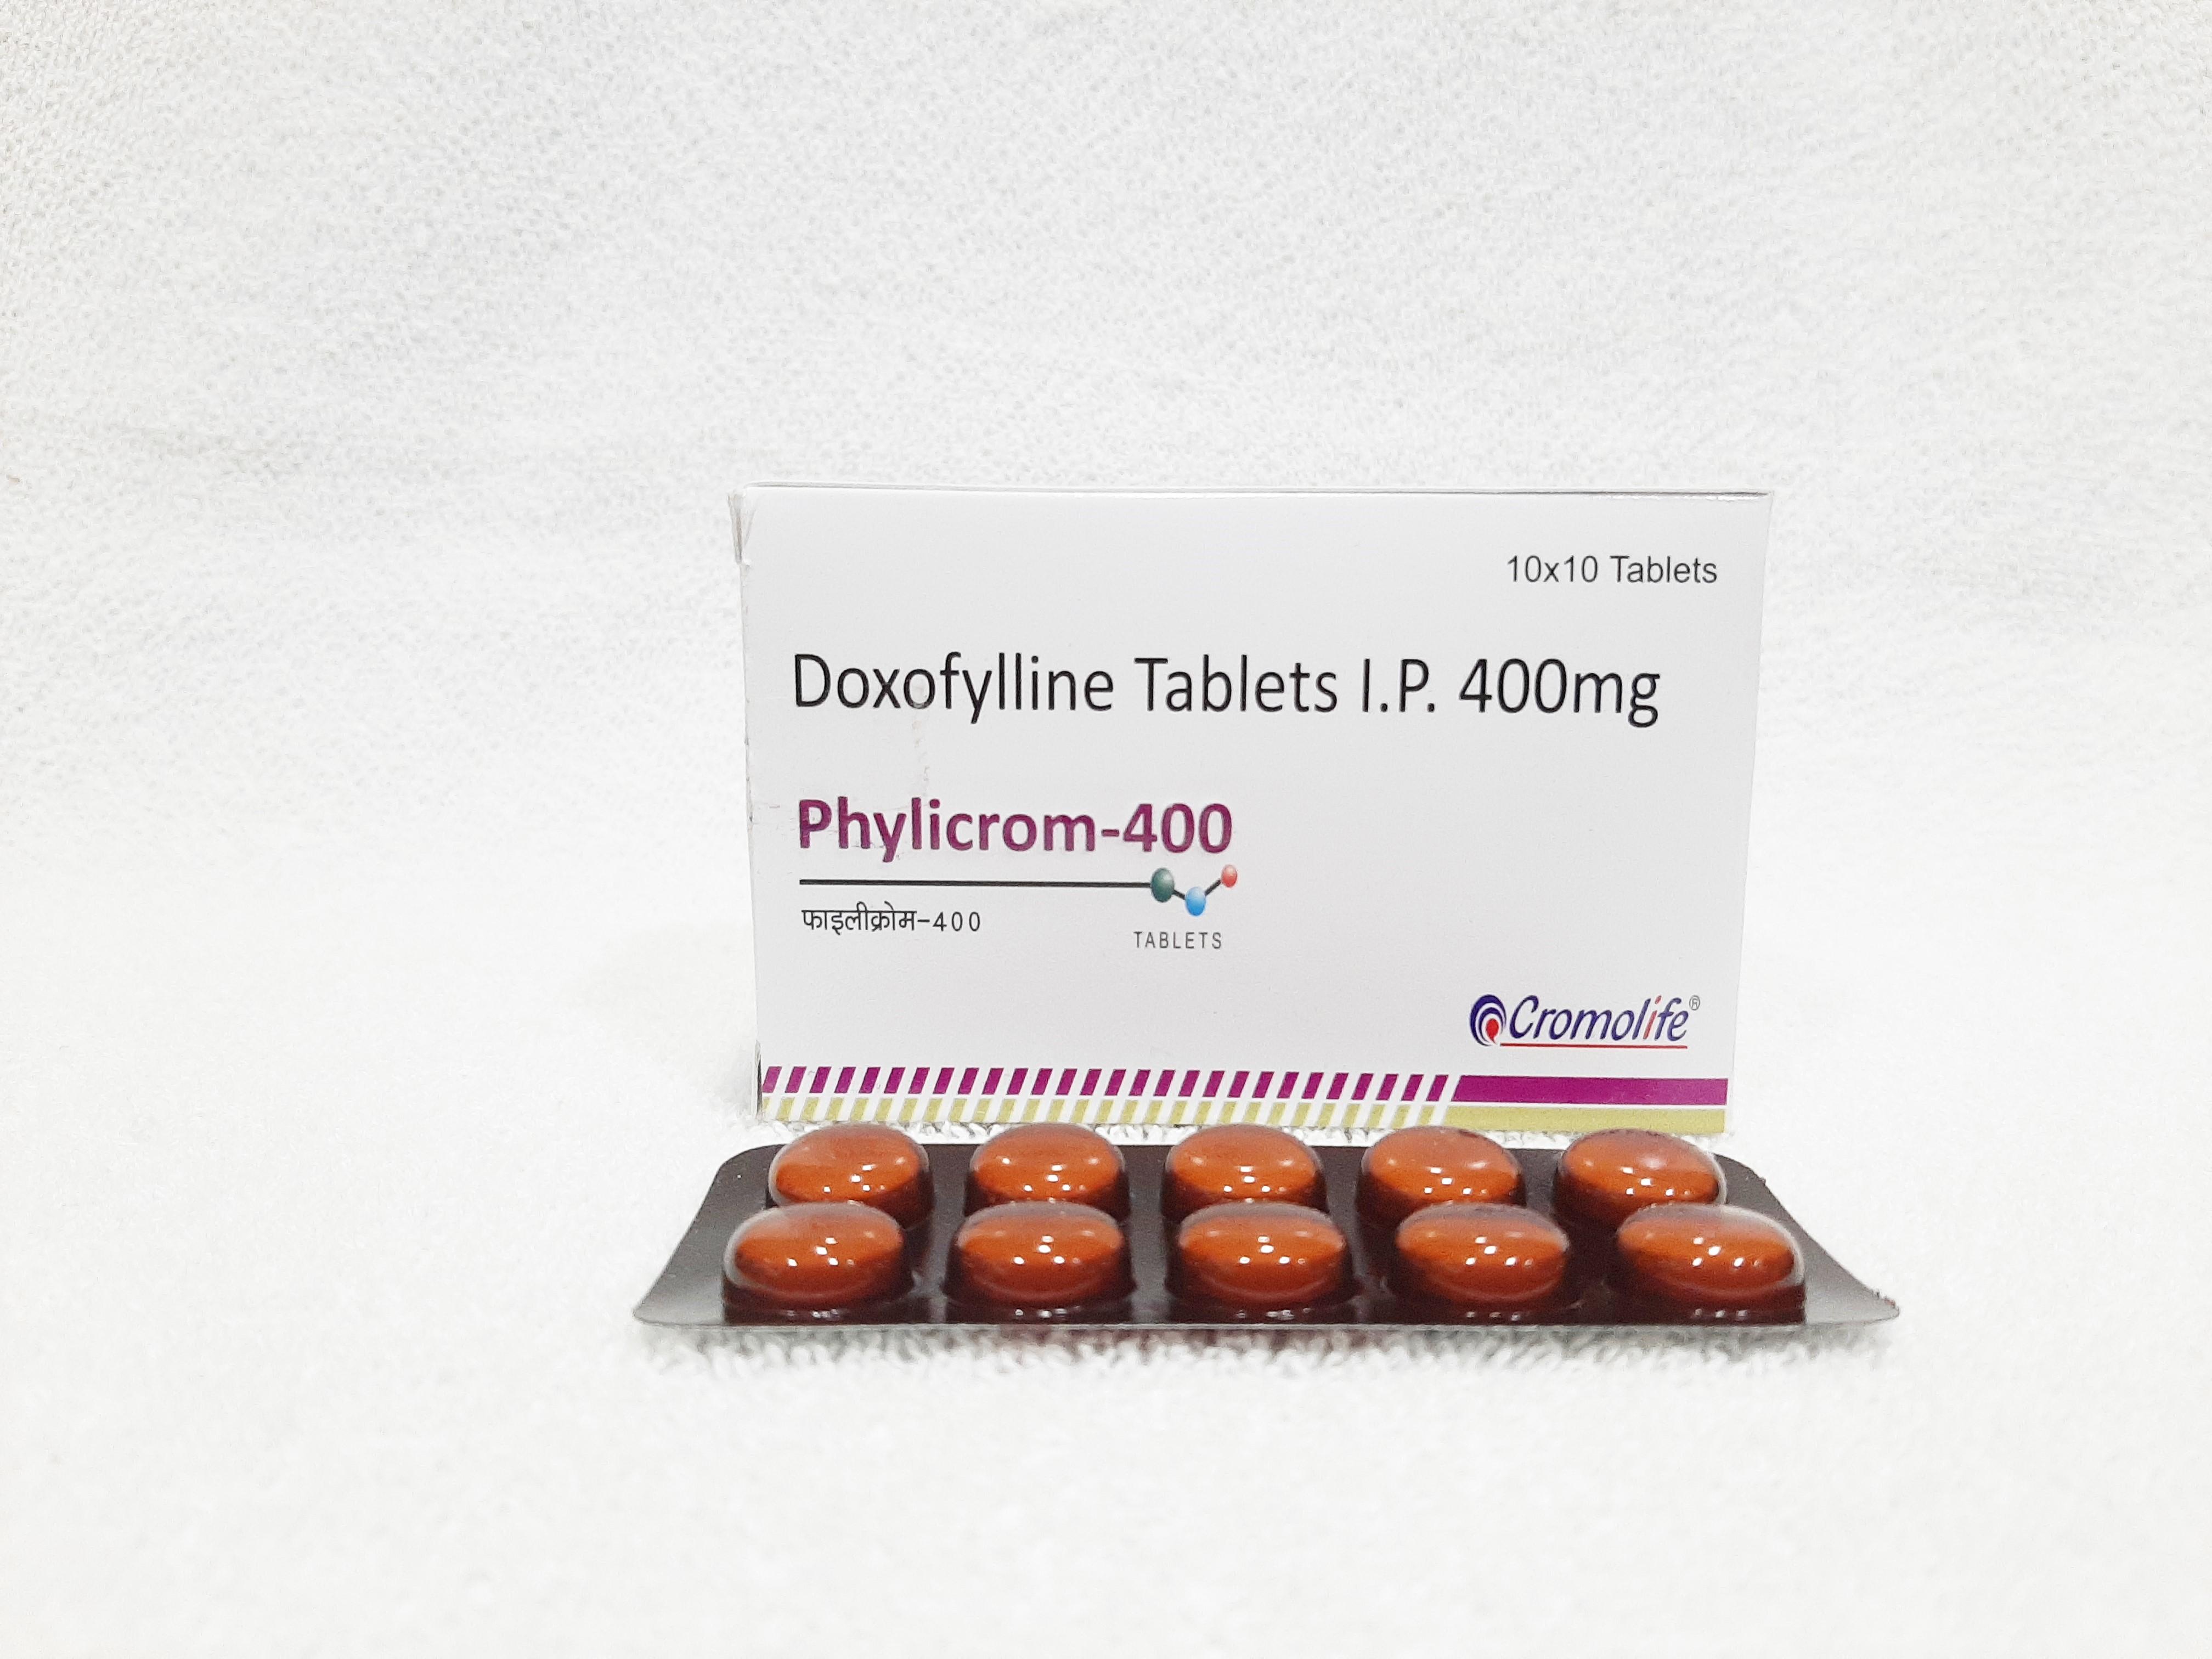 400 MG Doxofylline Tablets I.P.